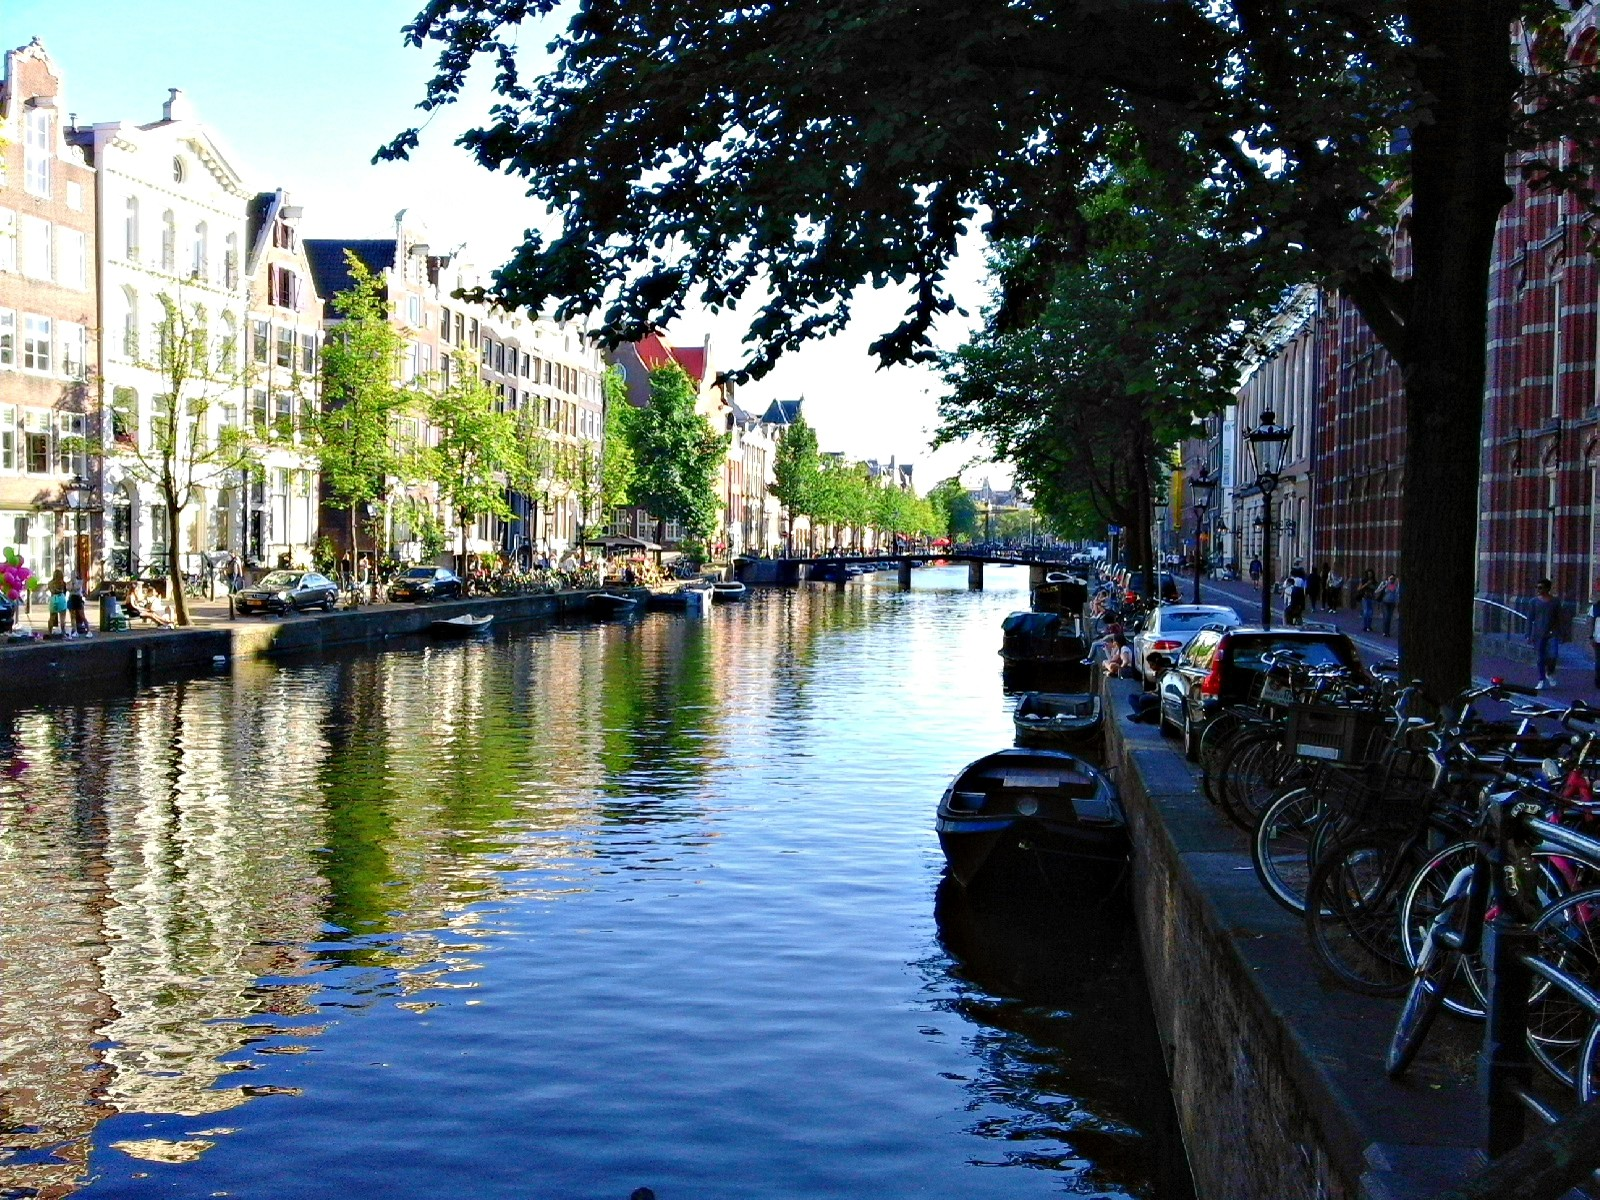 22-wonders-amsterdam-925fd94d3dadb0d42c3